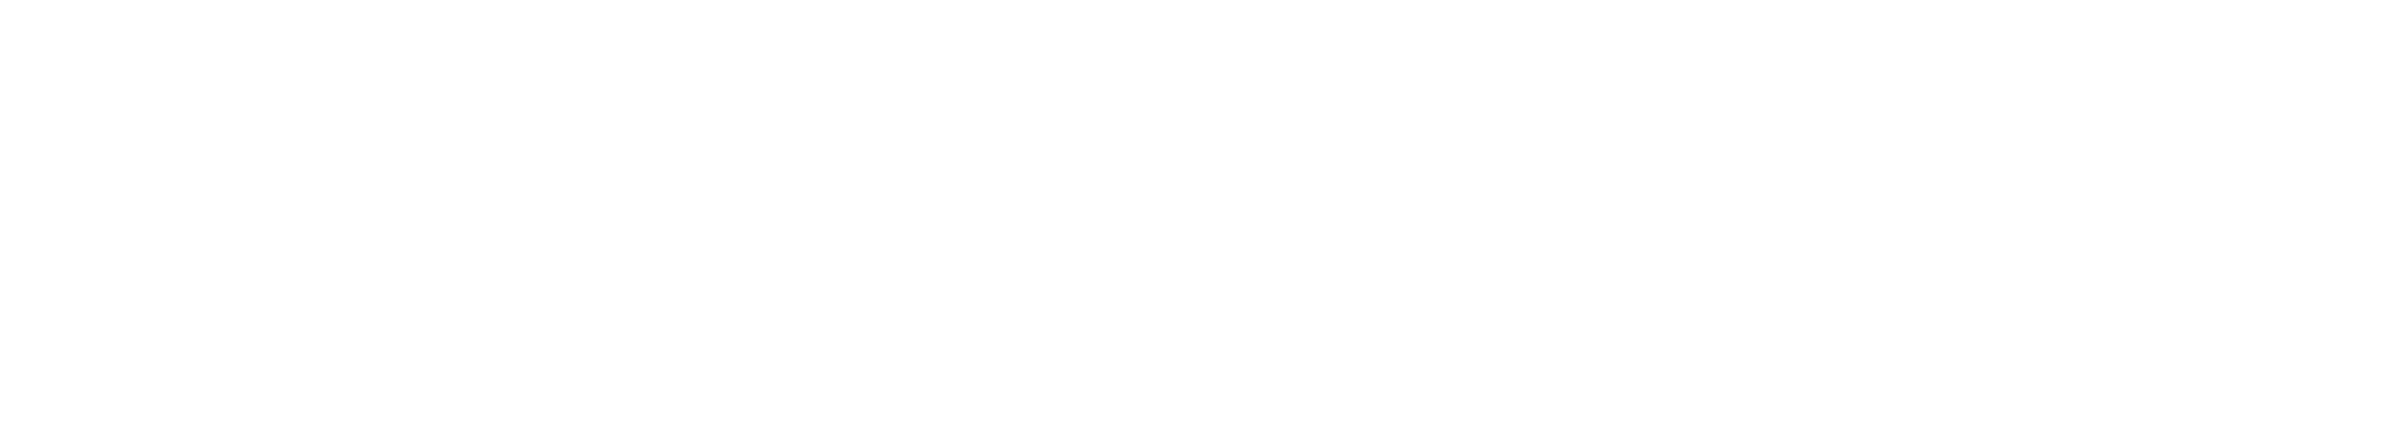 DesignClass logo